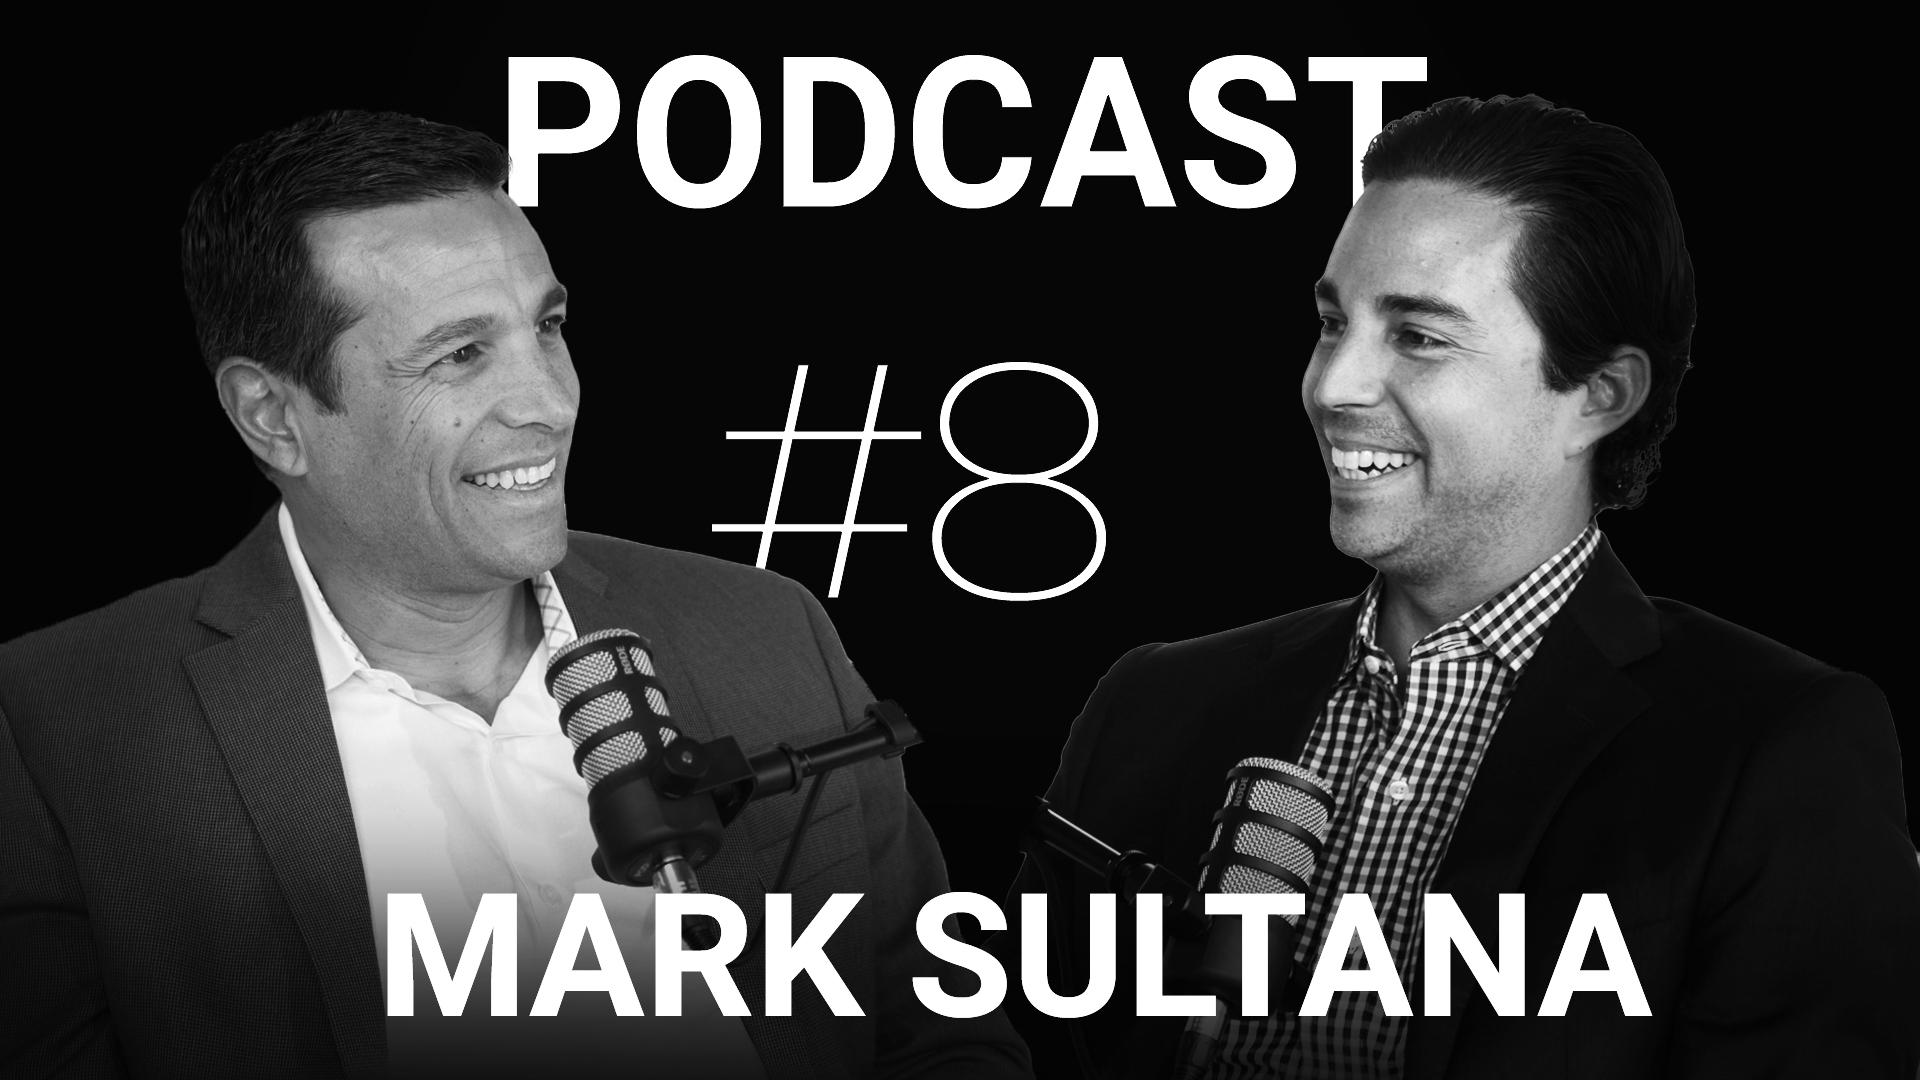 Mark Sultana and Robert Millgan